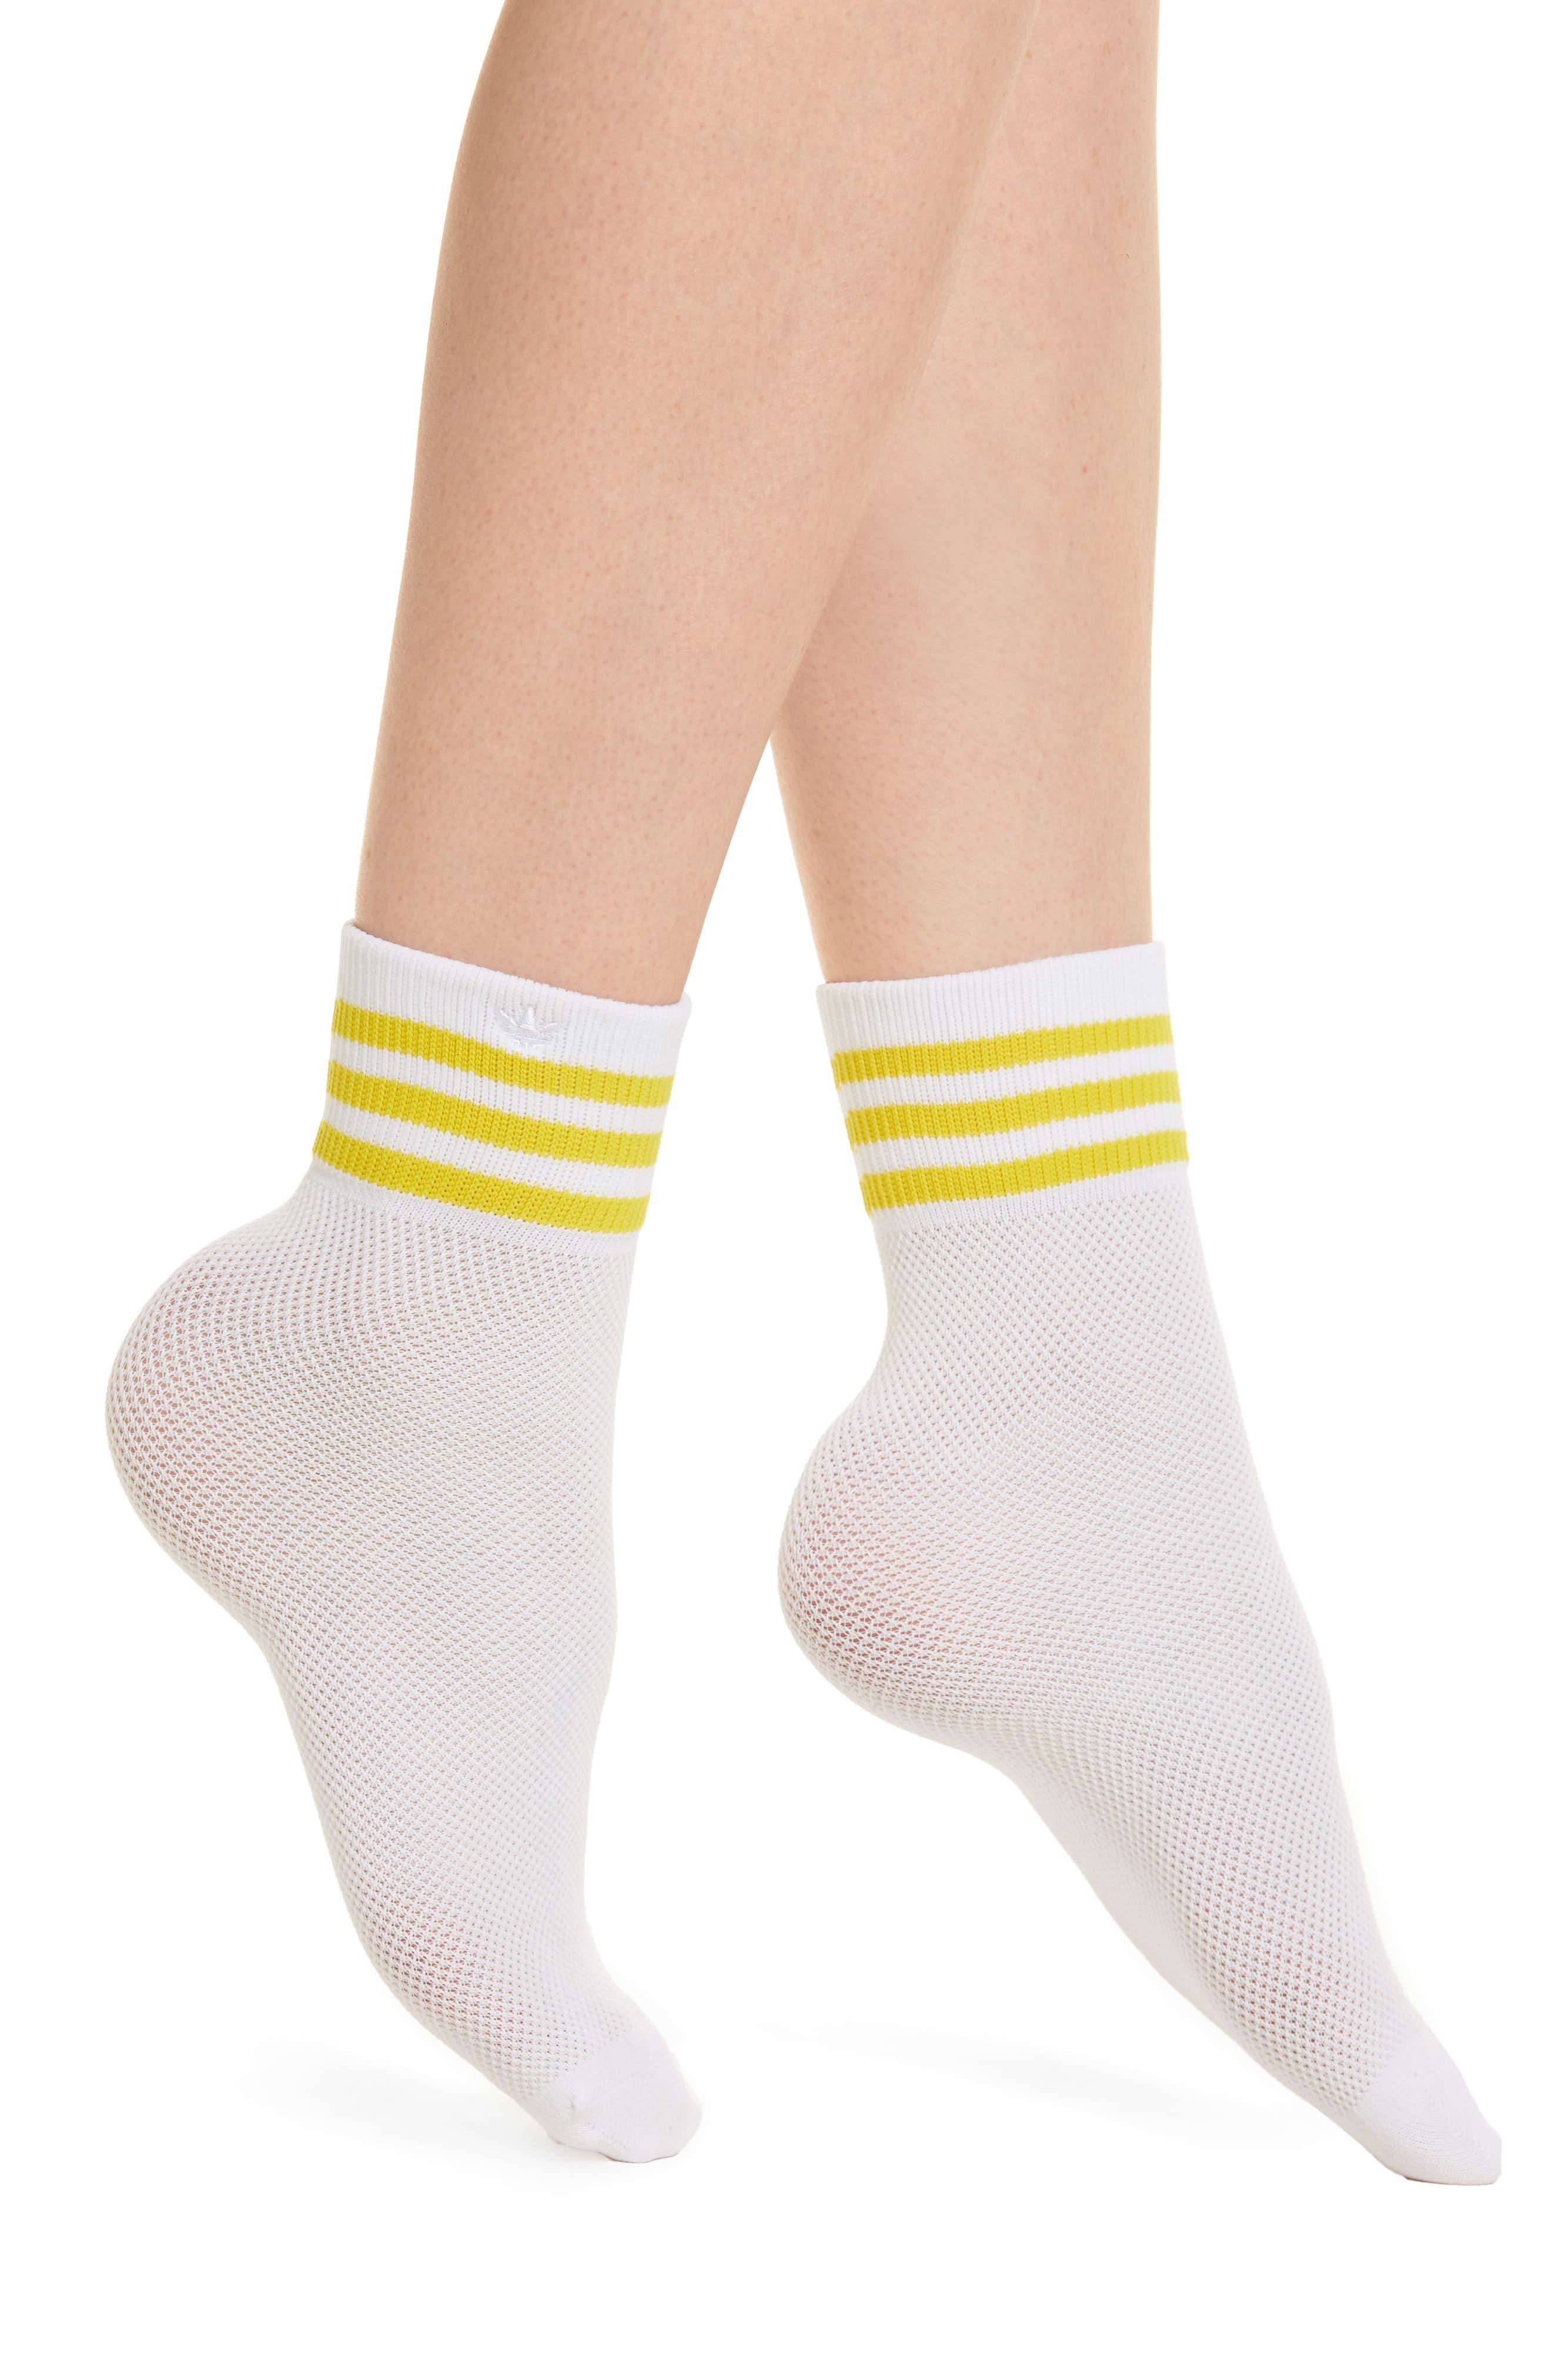 Stripe Mesh Ankle Socks,                             Main thumbnail 1, color,                             White/ Yellow